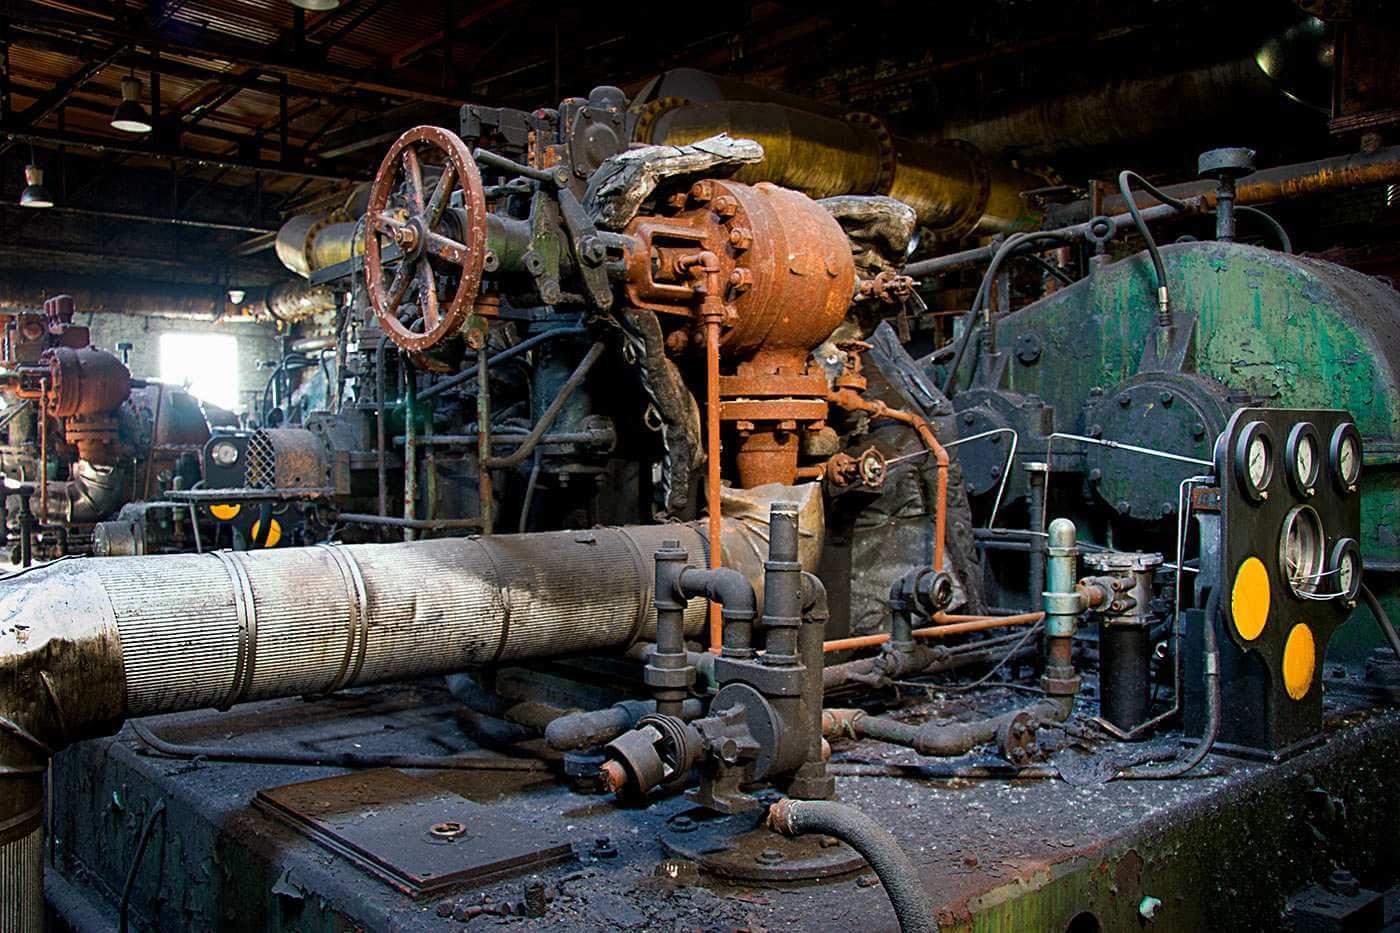 Machine belch